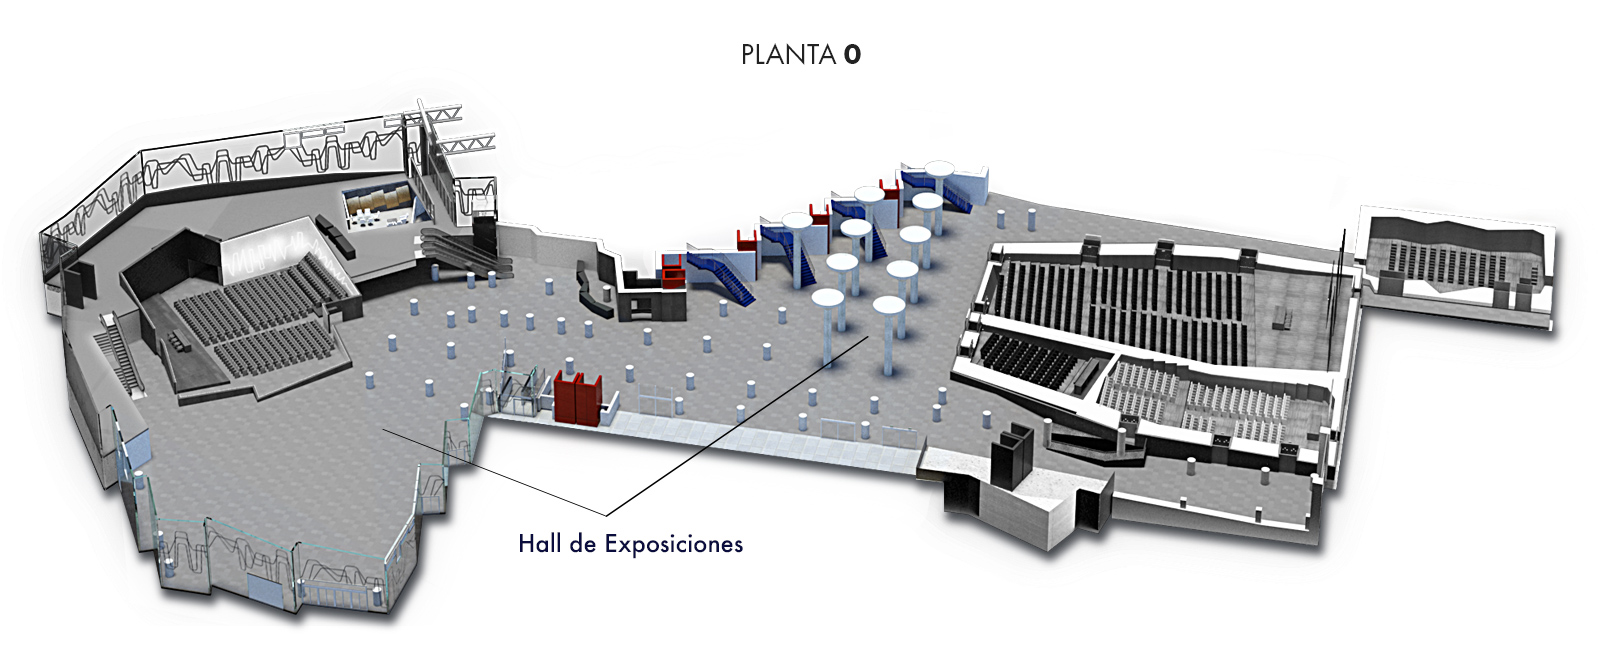 Hall de Exposiciones, Planta 0 | Palacio Euskalduna Jauregia